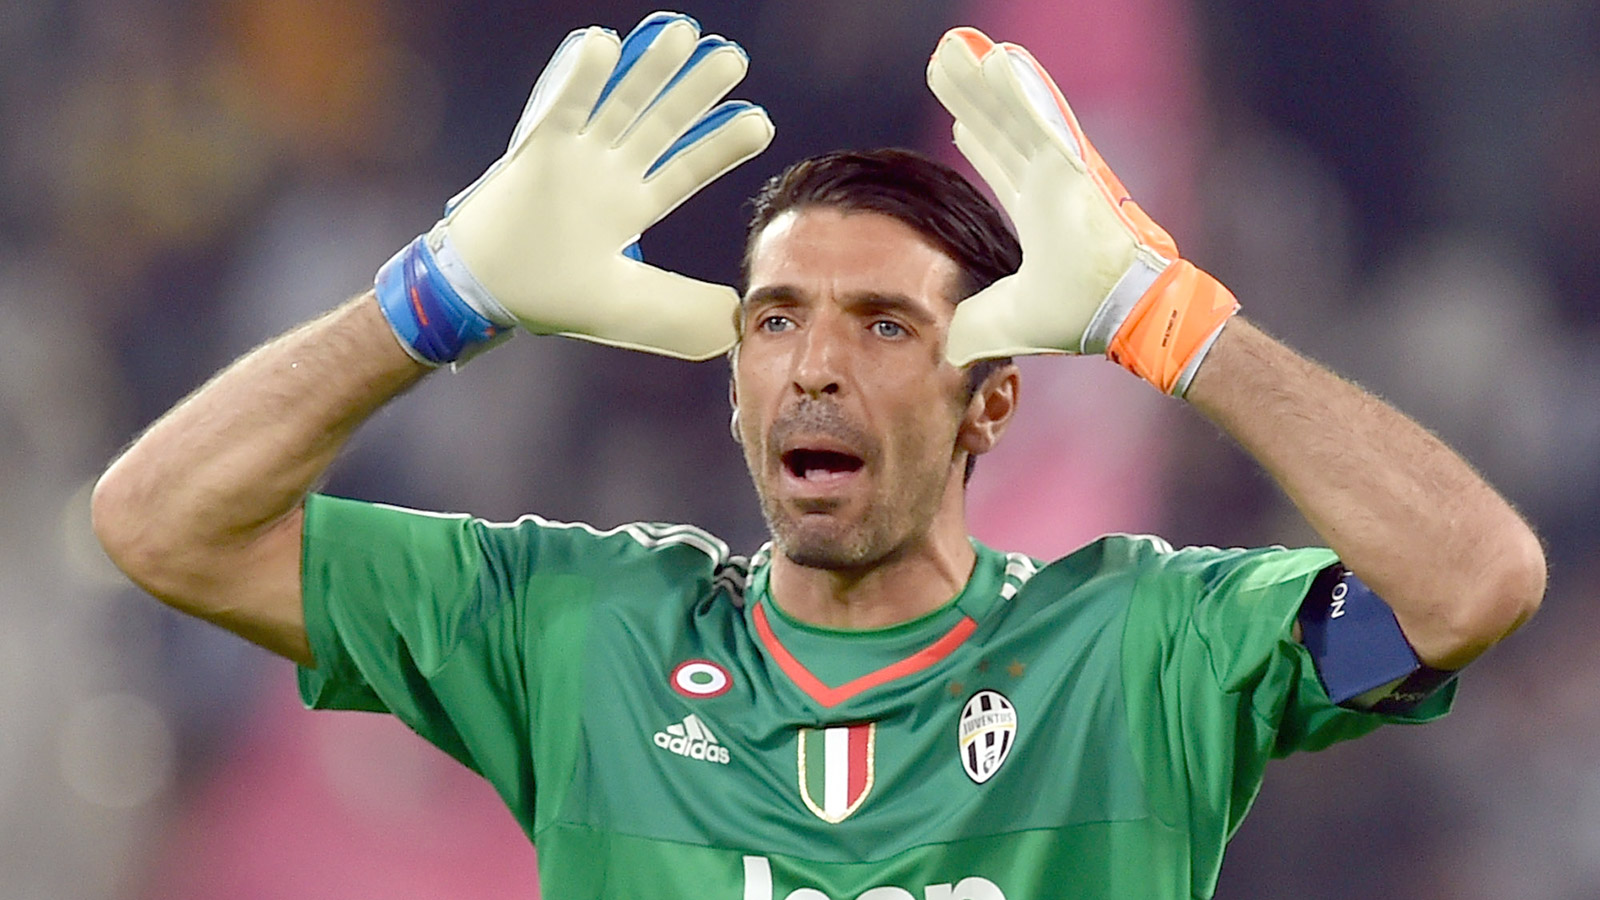 Juventus captain Buffon criticizes 'unacceptable' loss to Sassuolo